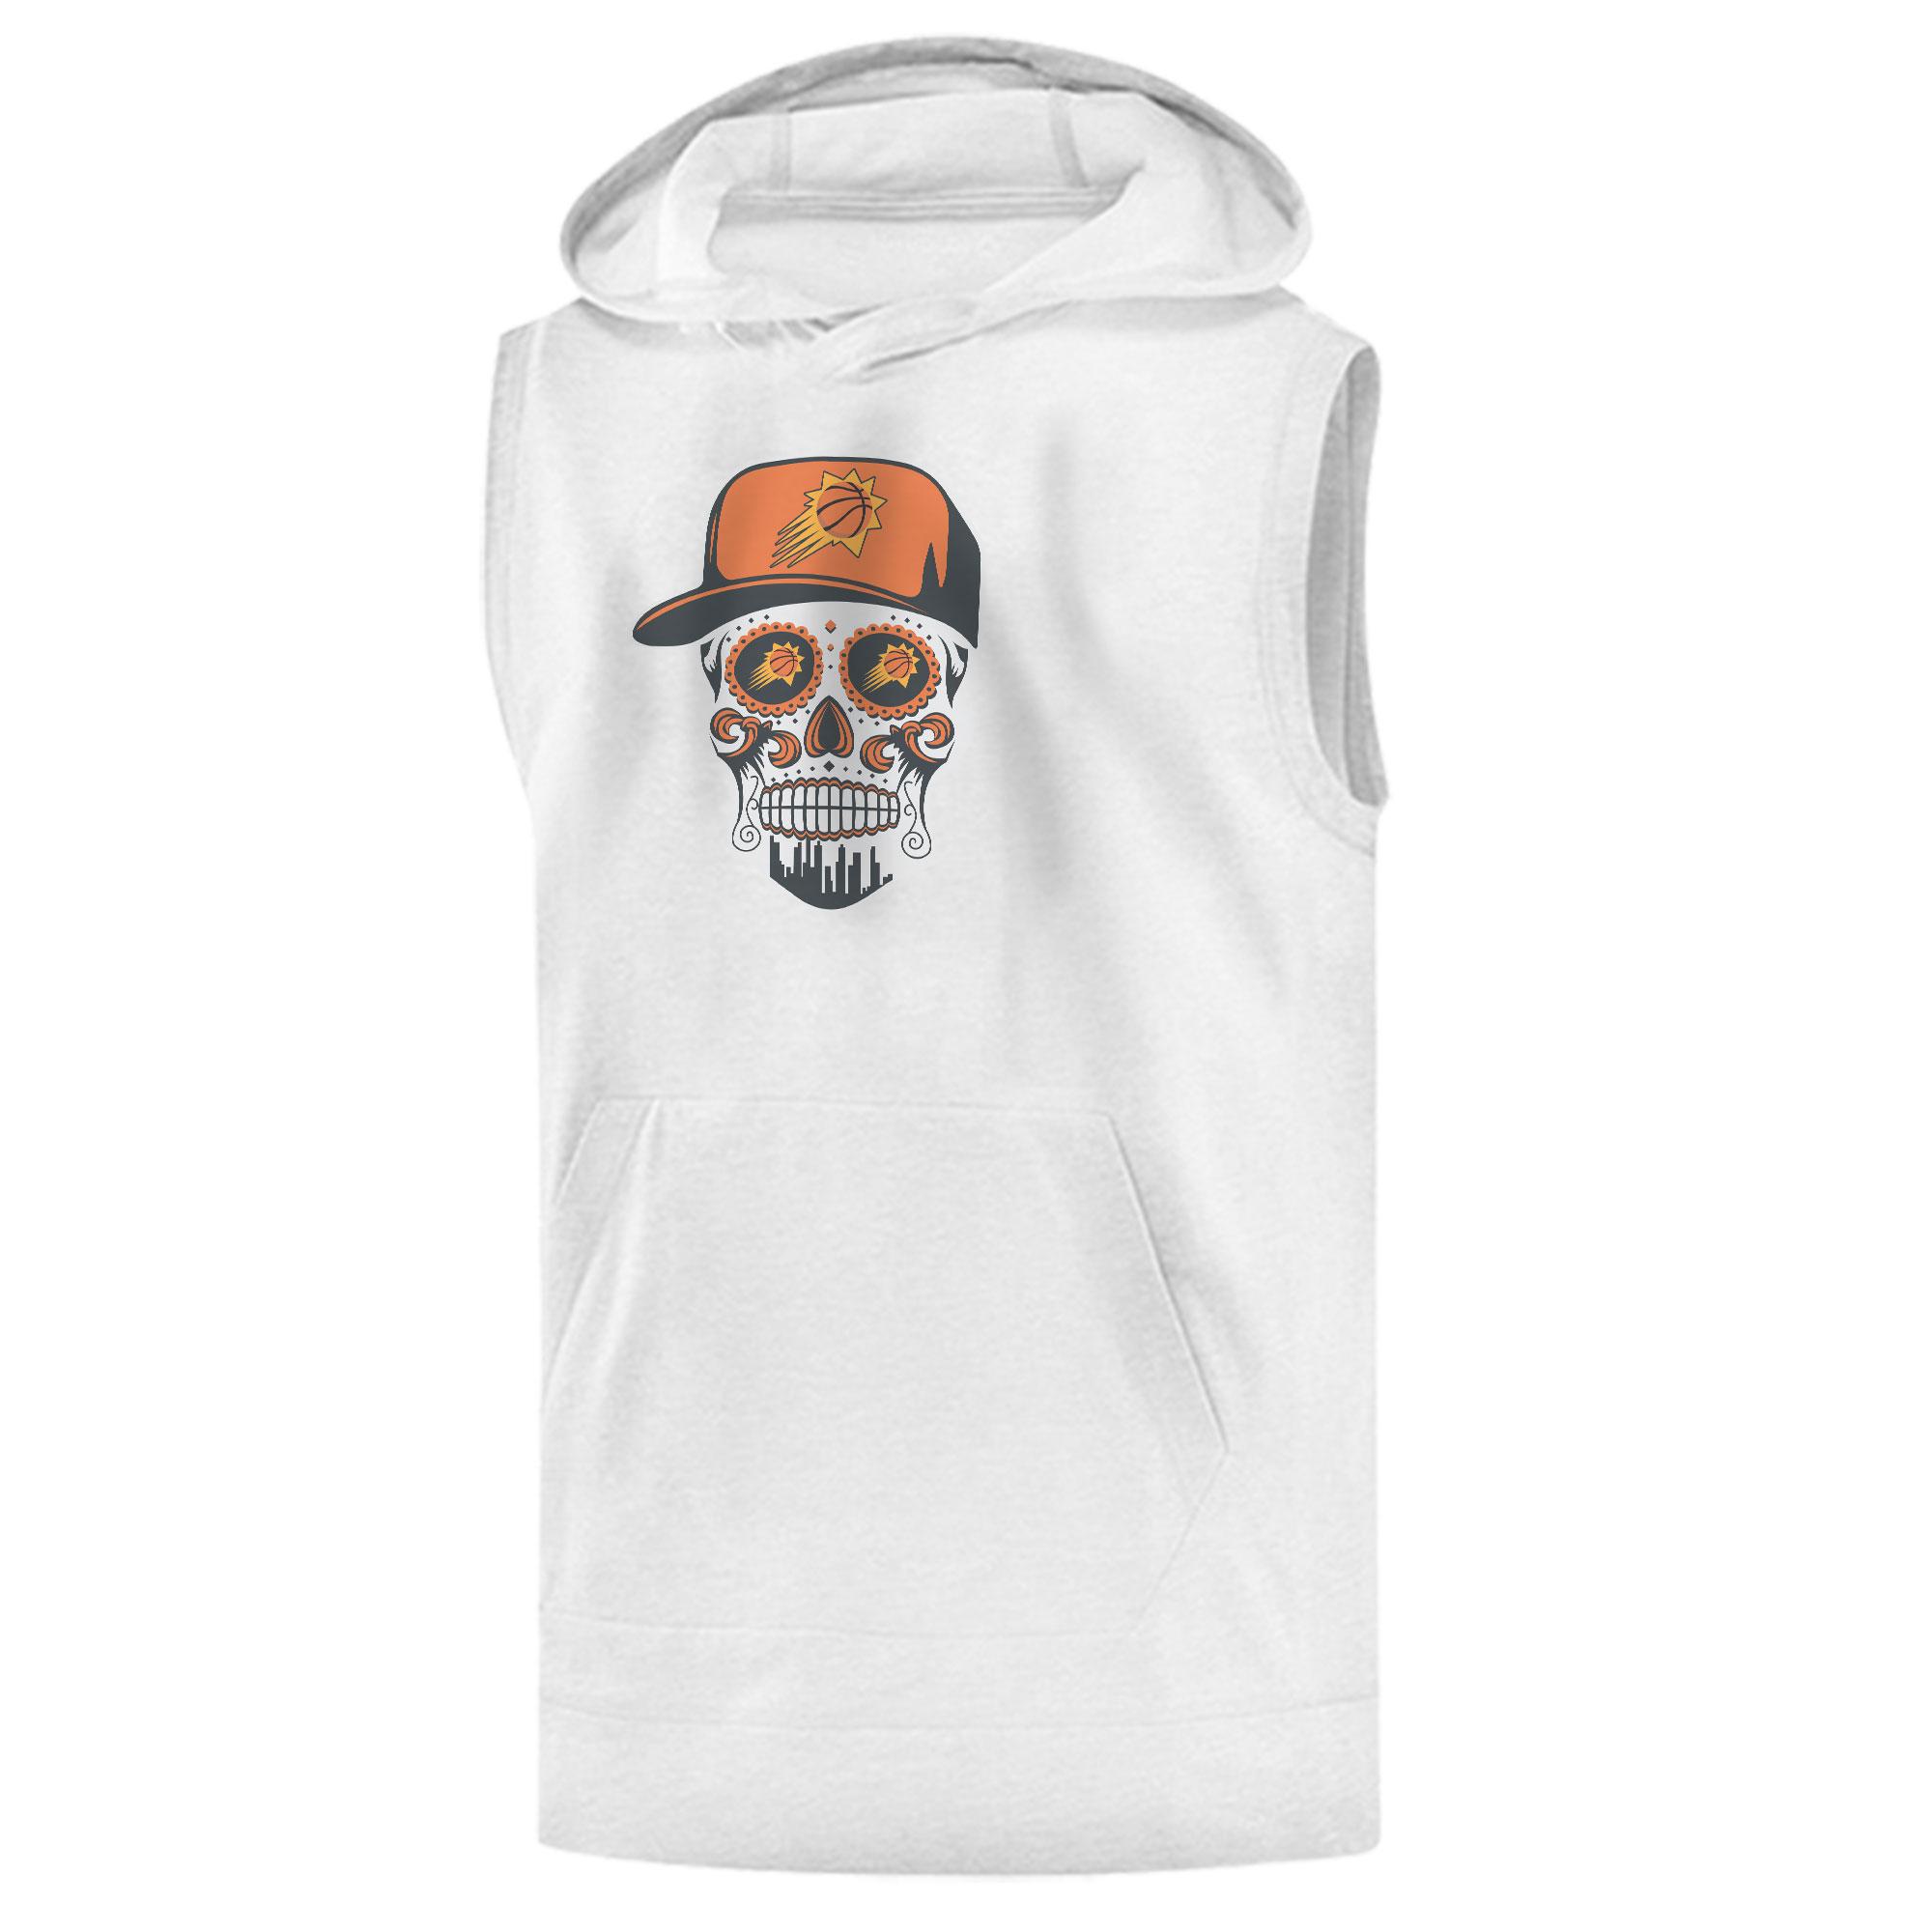 Phoenix Skull Sleeveless (KLS-WHT-NP-461-NBA-PHO-SKULL)